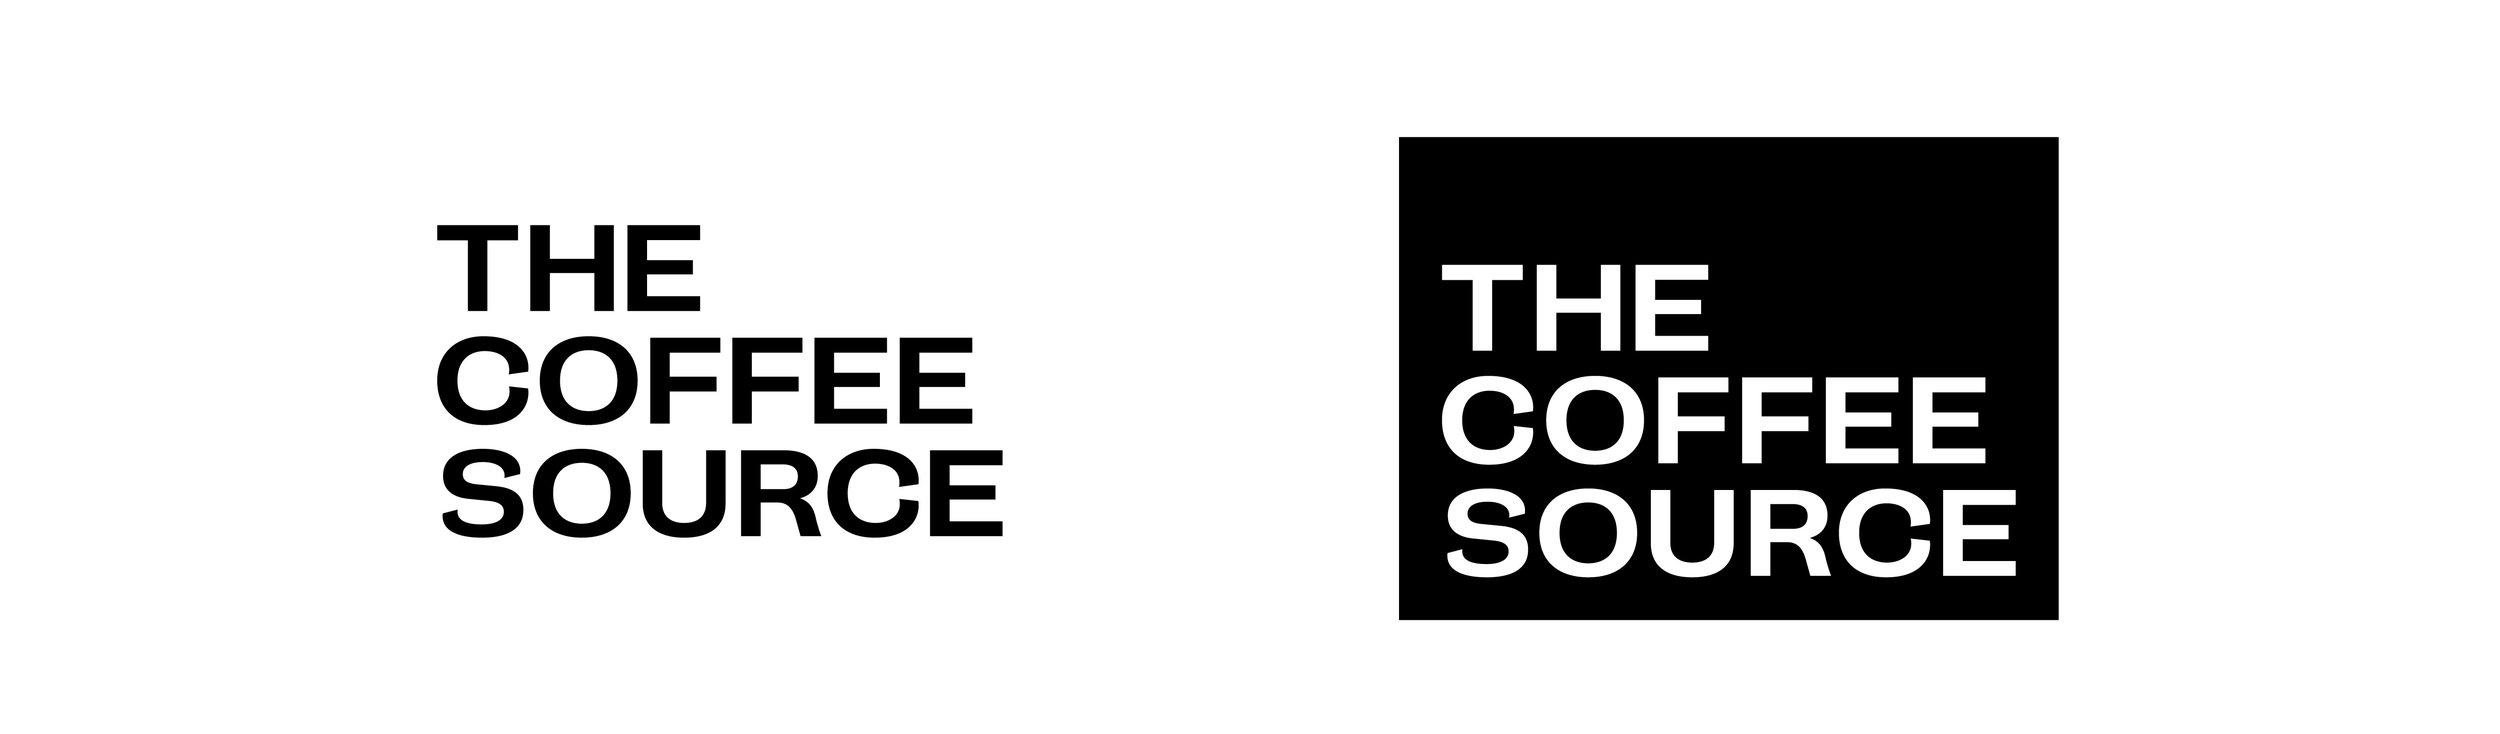 the coffee source_gallery-01.jpg